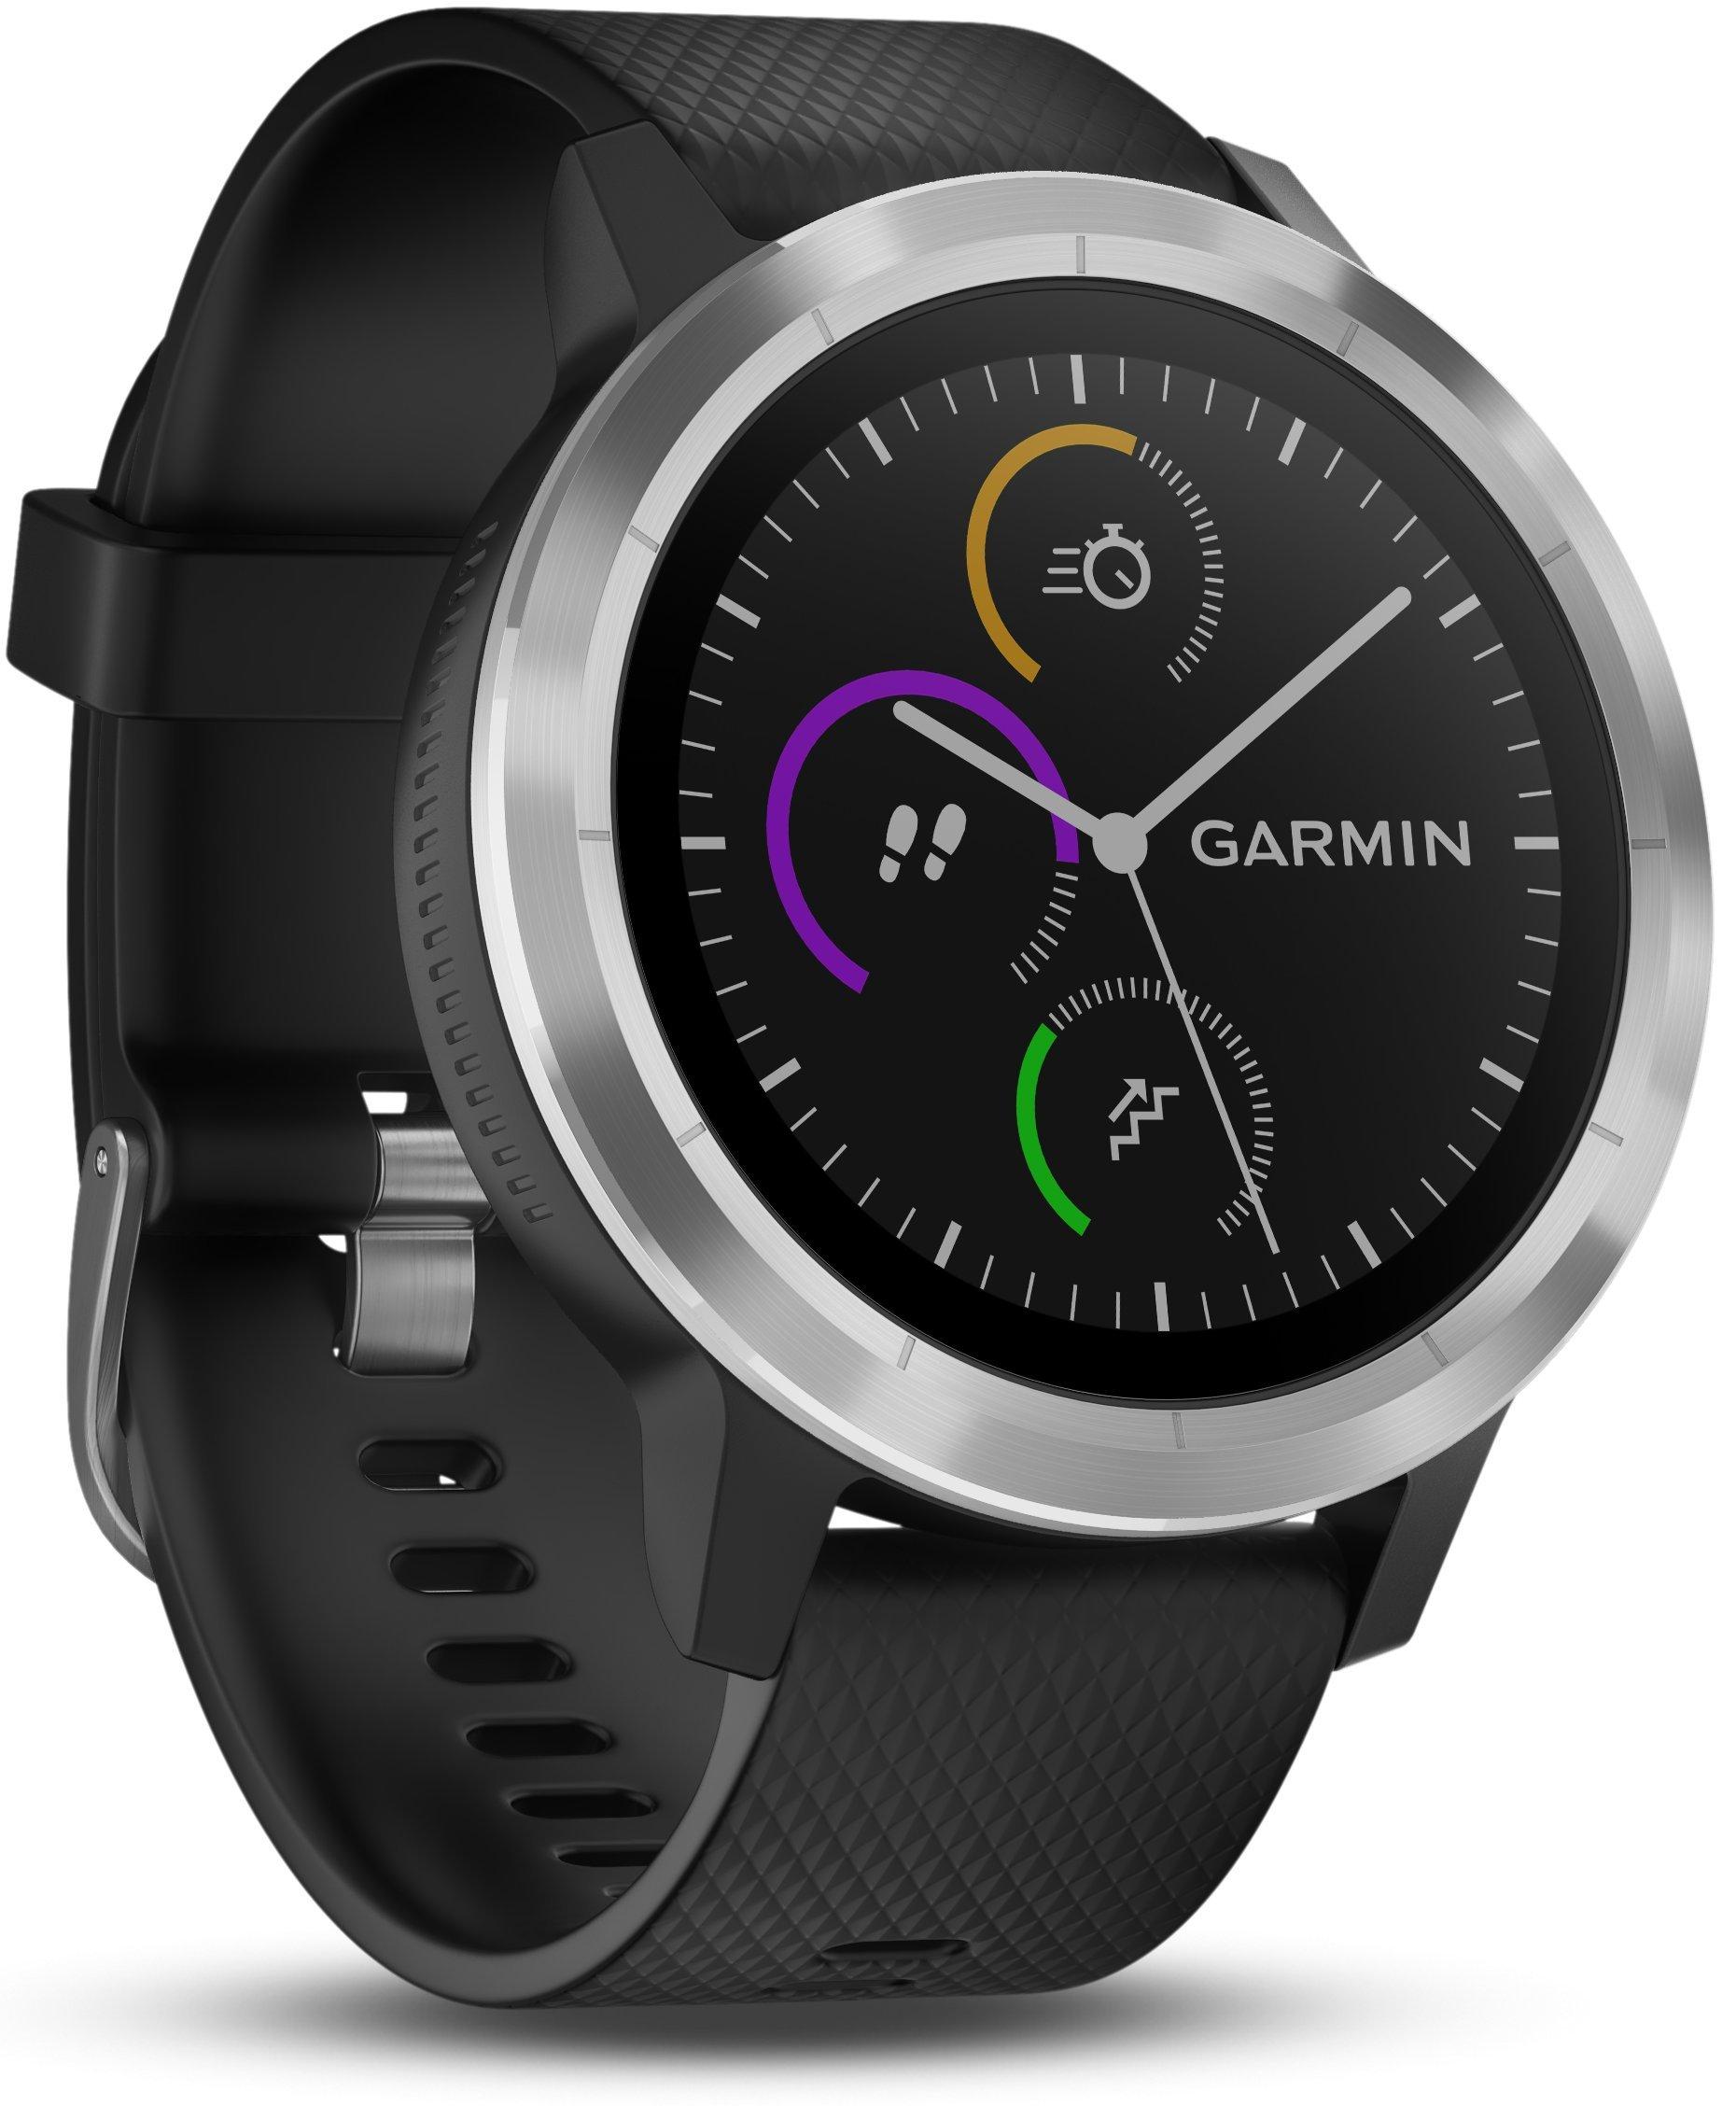 Garmin Vivoactive 3 Smartwatch GPS con Profili Sport, Sensore Cardio e Pagamento Contactless, Nero/Argento product image